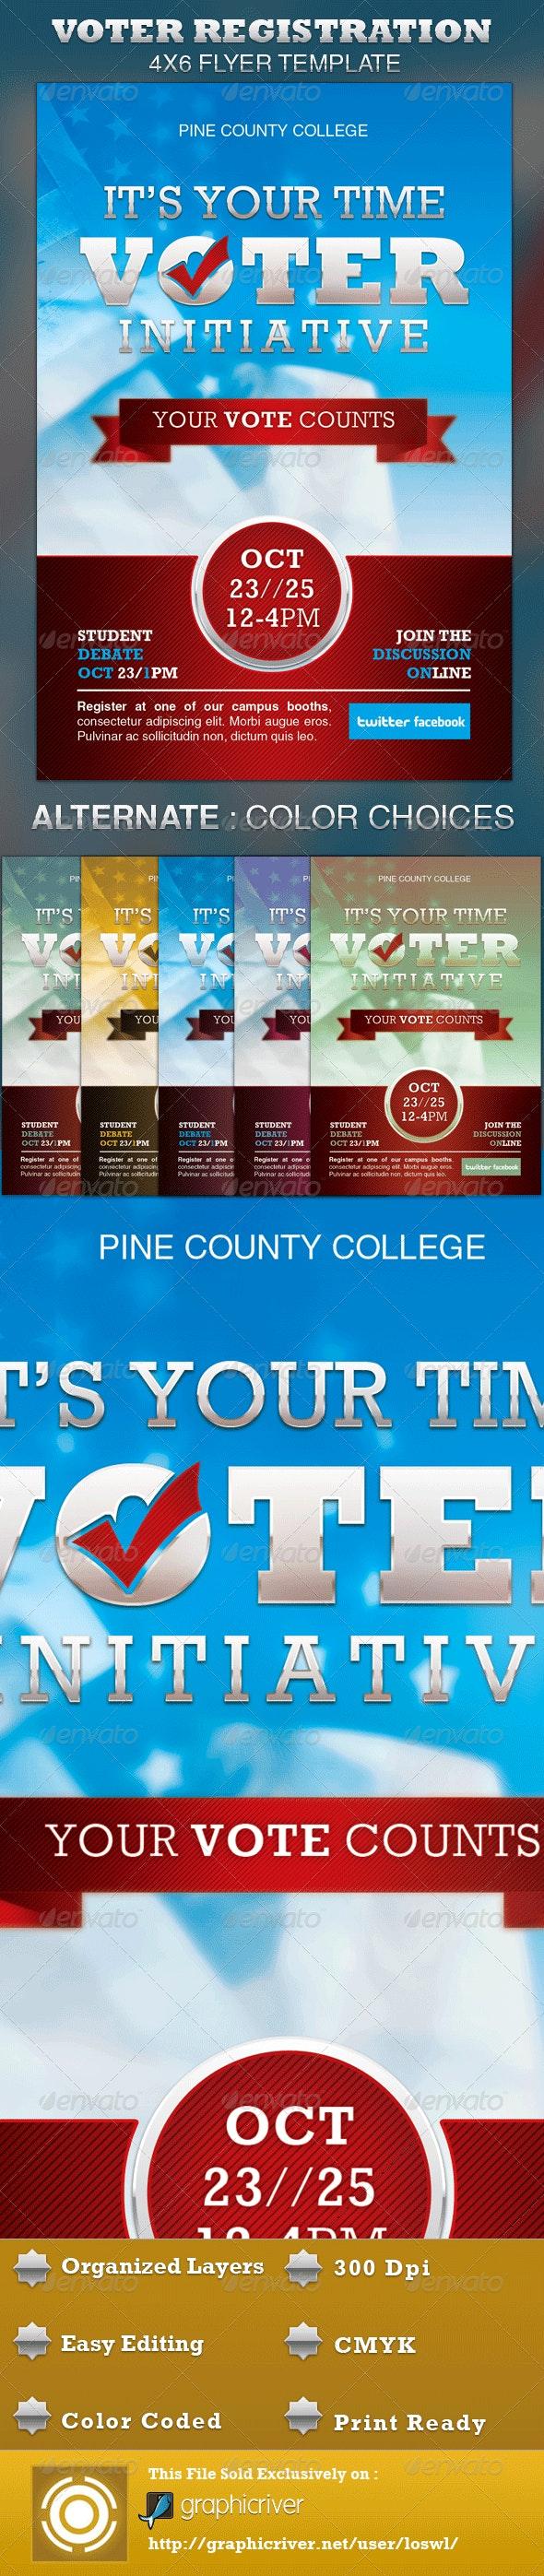 Voter Registration Drive Flyer Template - Events Flyers